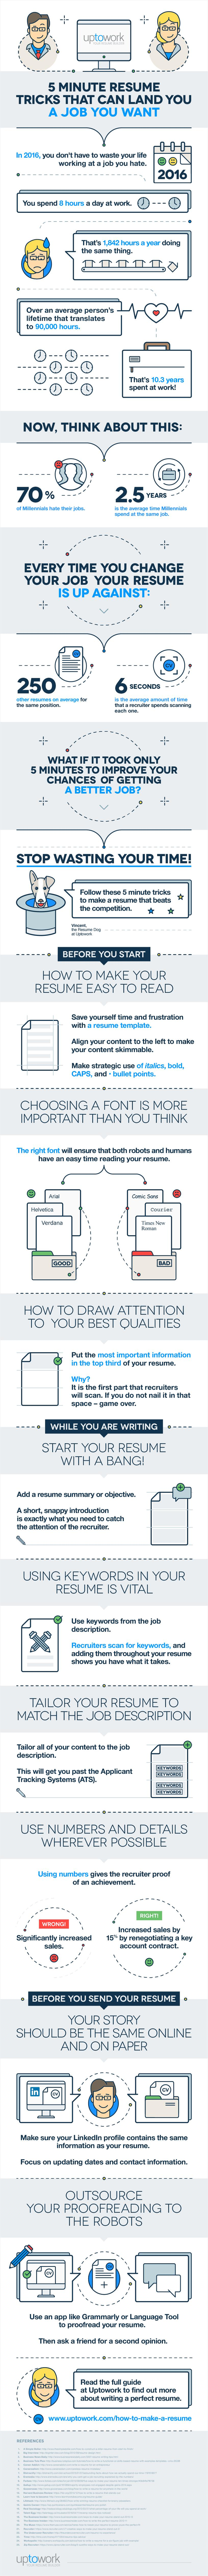 Uptowork Infographic